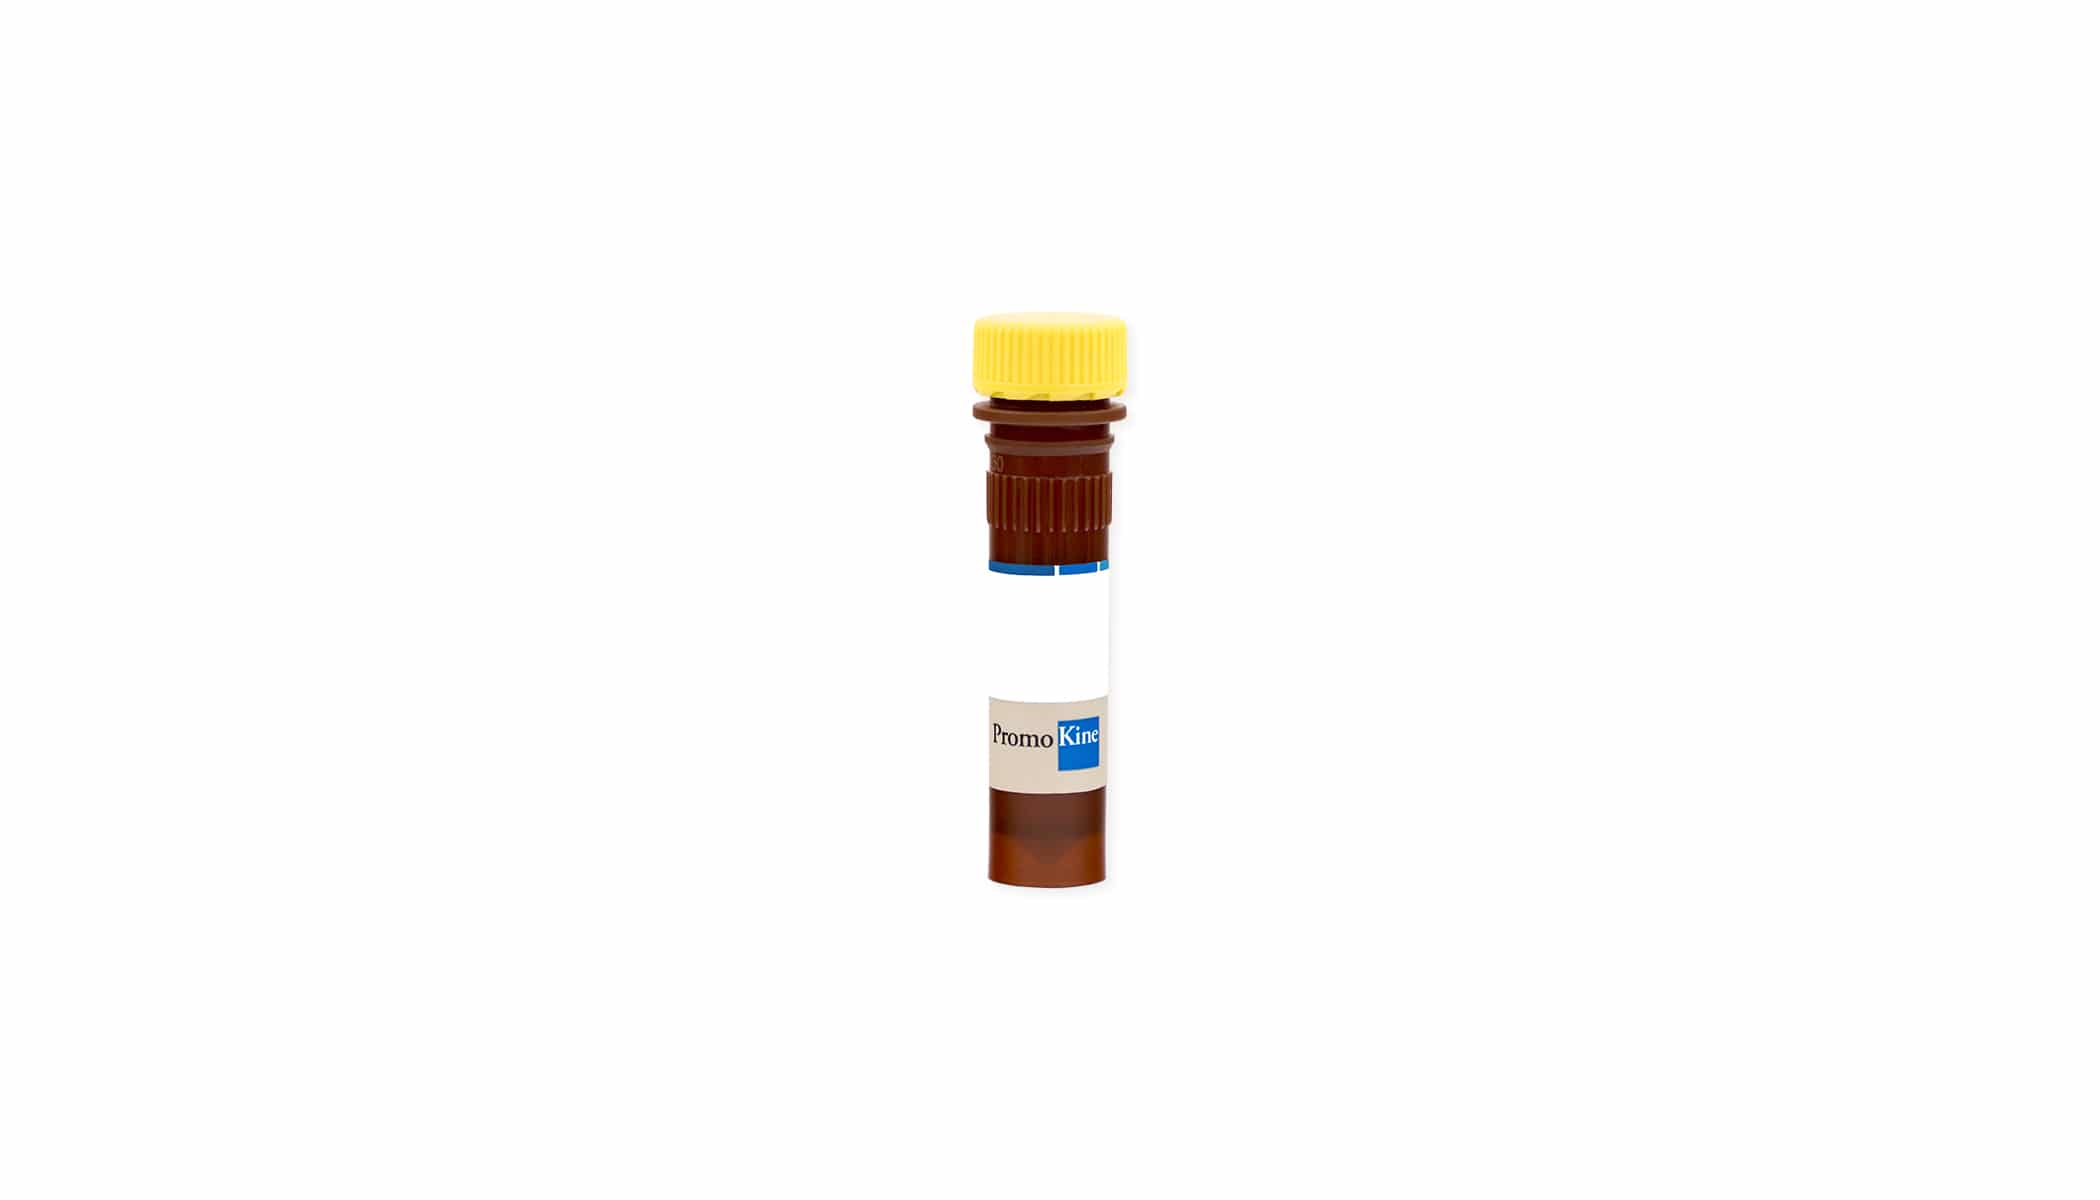 Caspase-9 Substrate LEHD-AFC